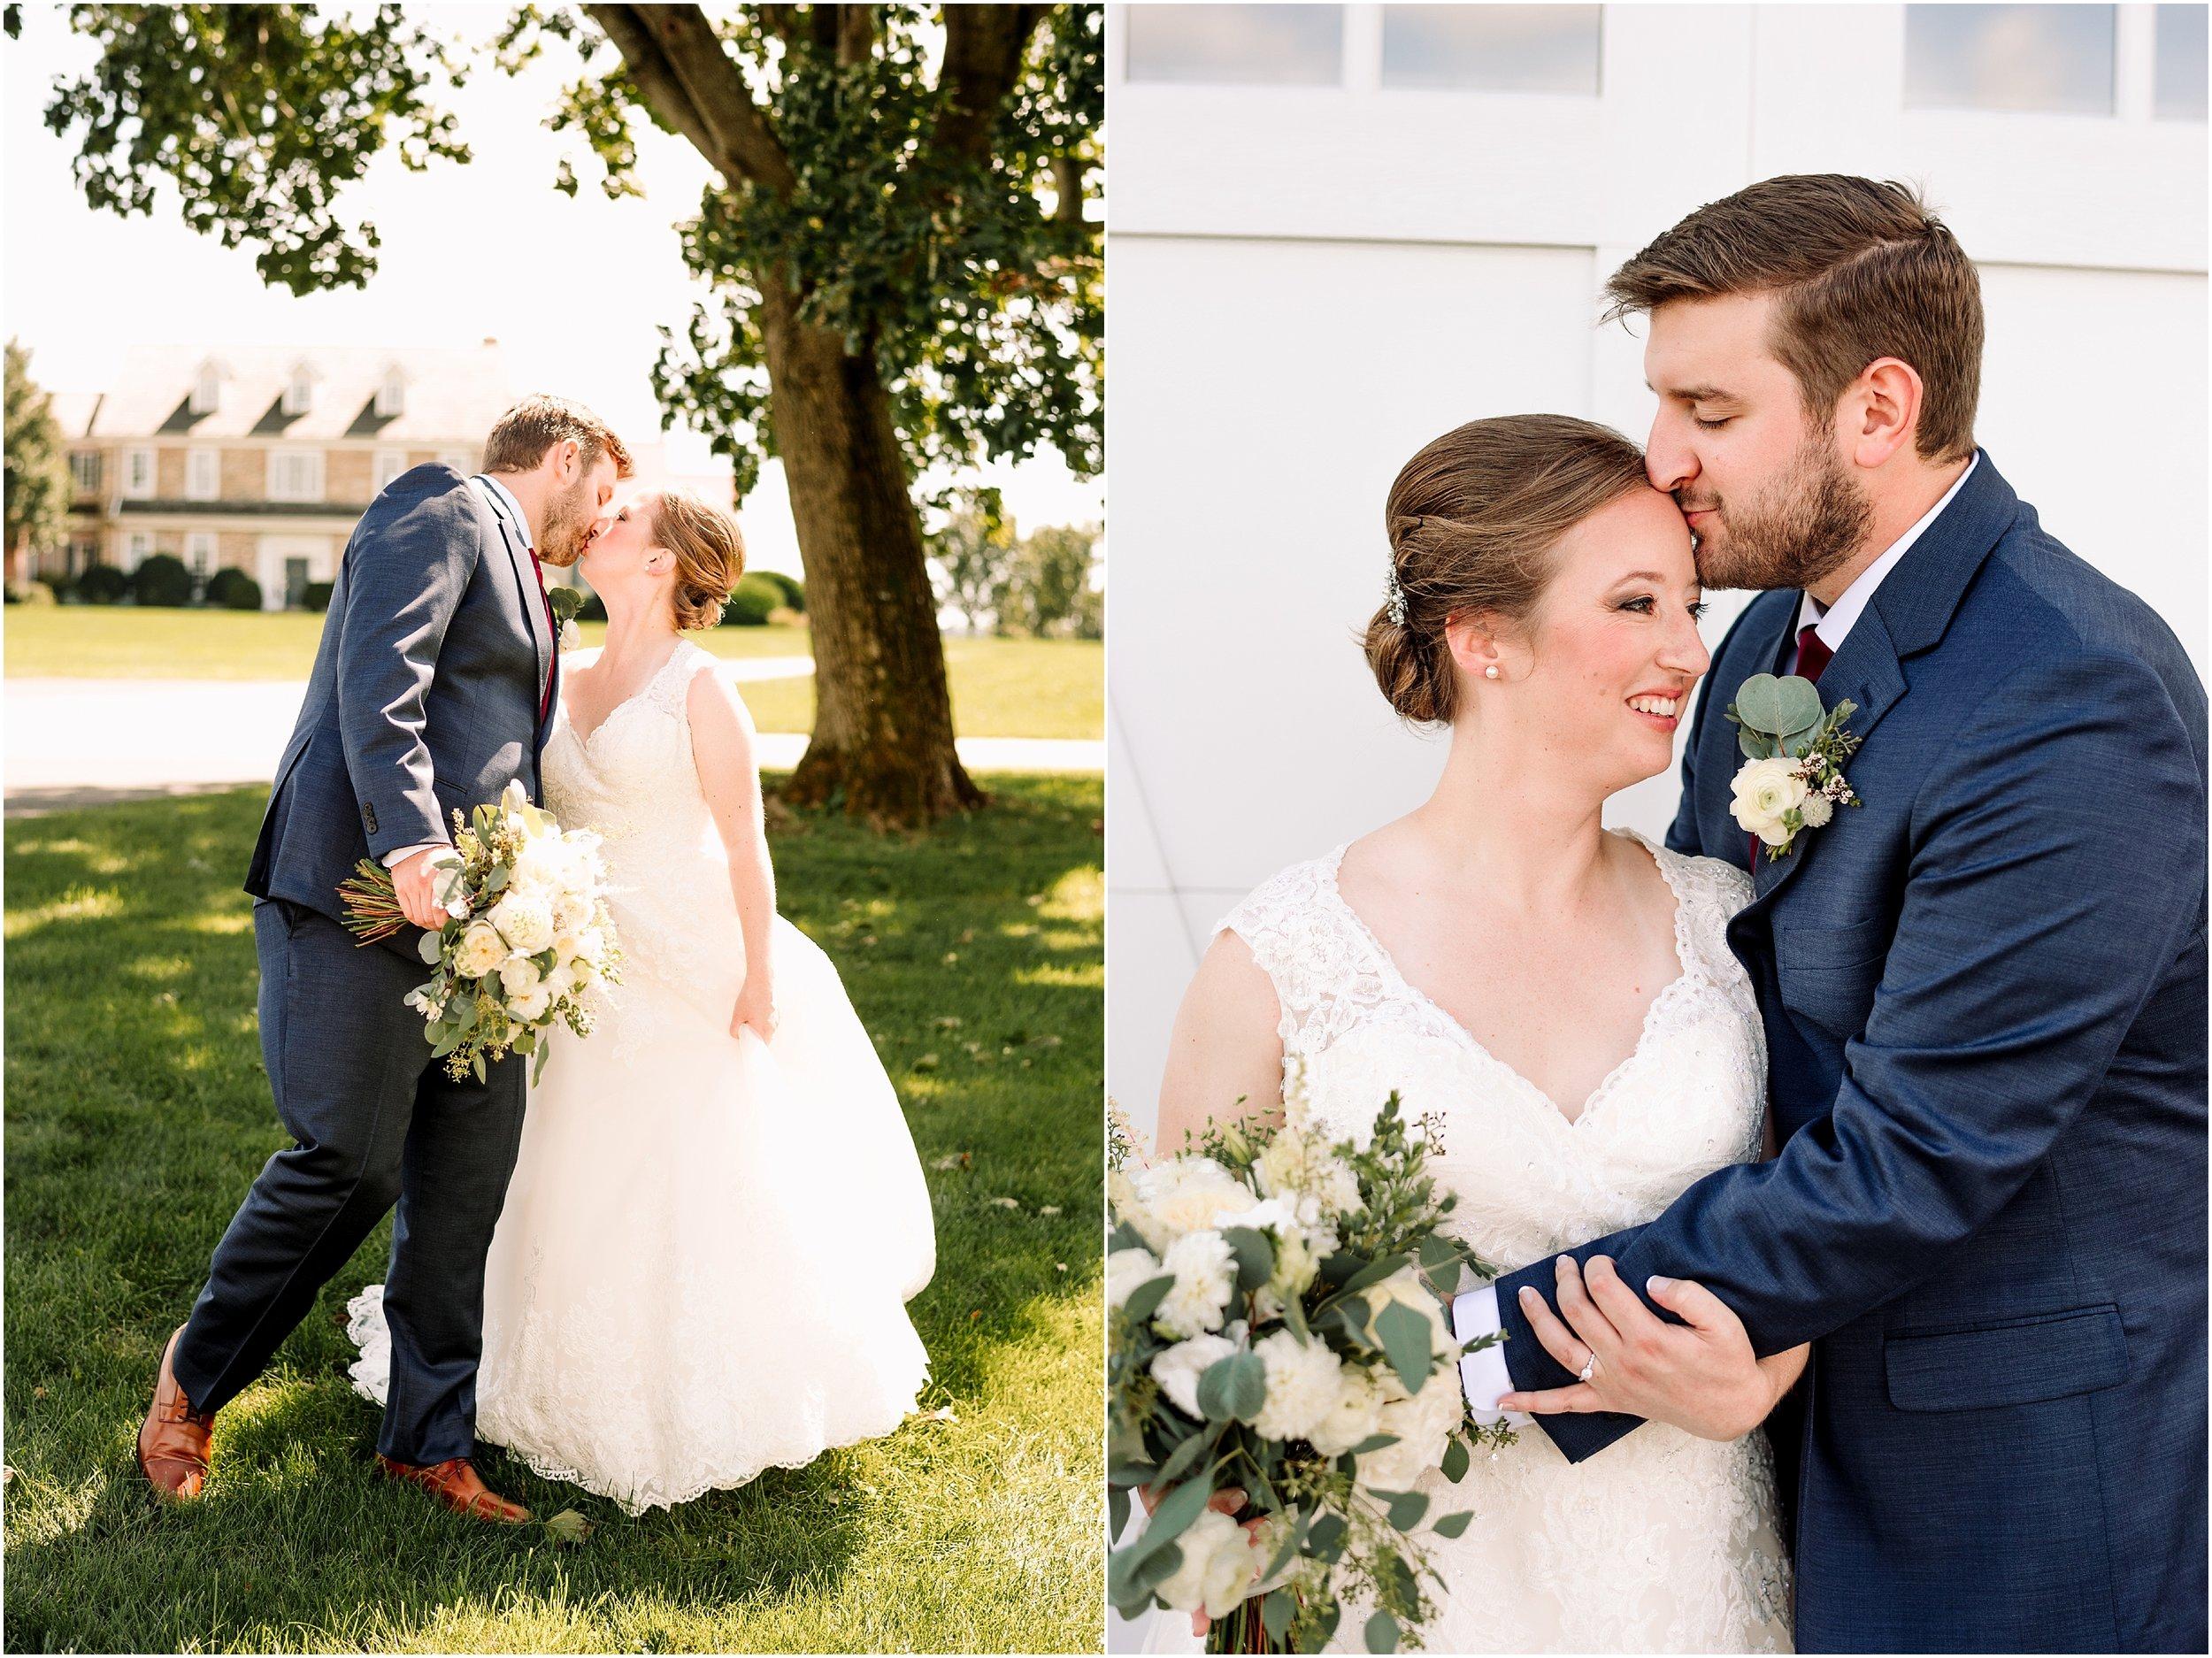 hannah leigh photography Wyndridge Farm Wedding York PA_1483.jpg